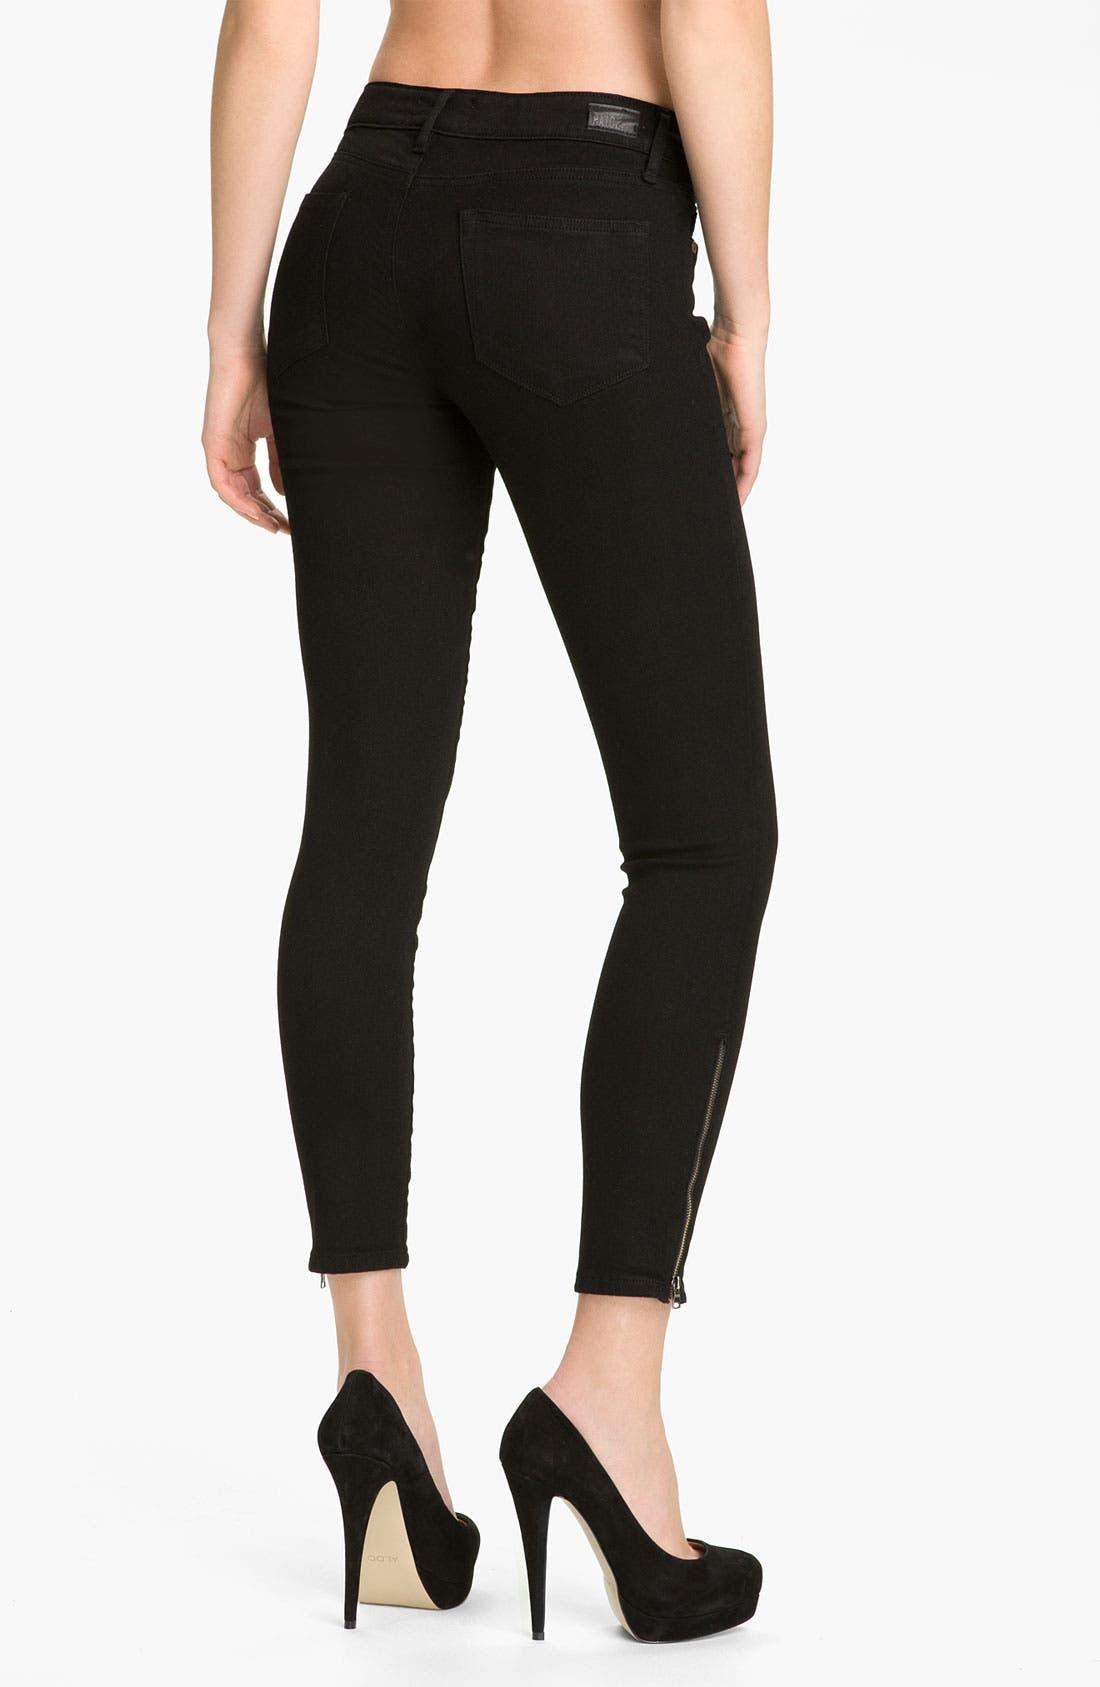 Alternate Image 2  - Paige Denim 'Verdugo' Ankle Zip Skinny Stretch Jeans (Black Ink)